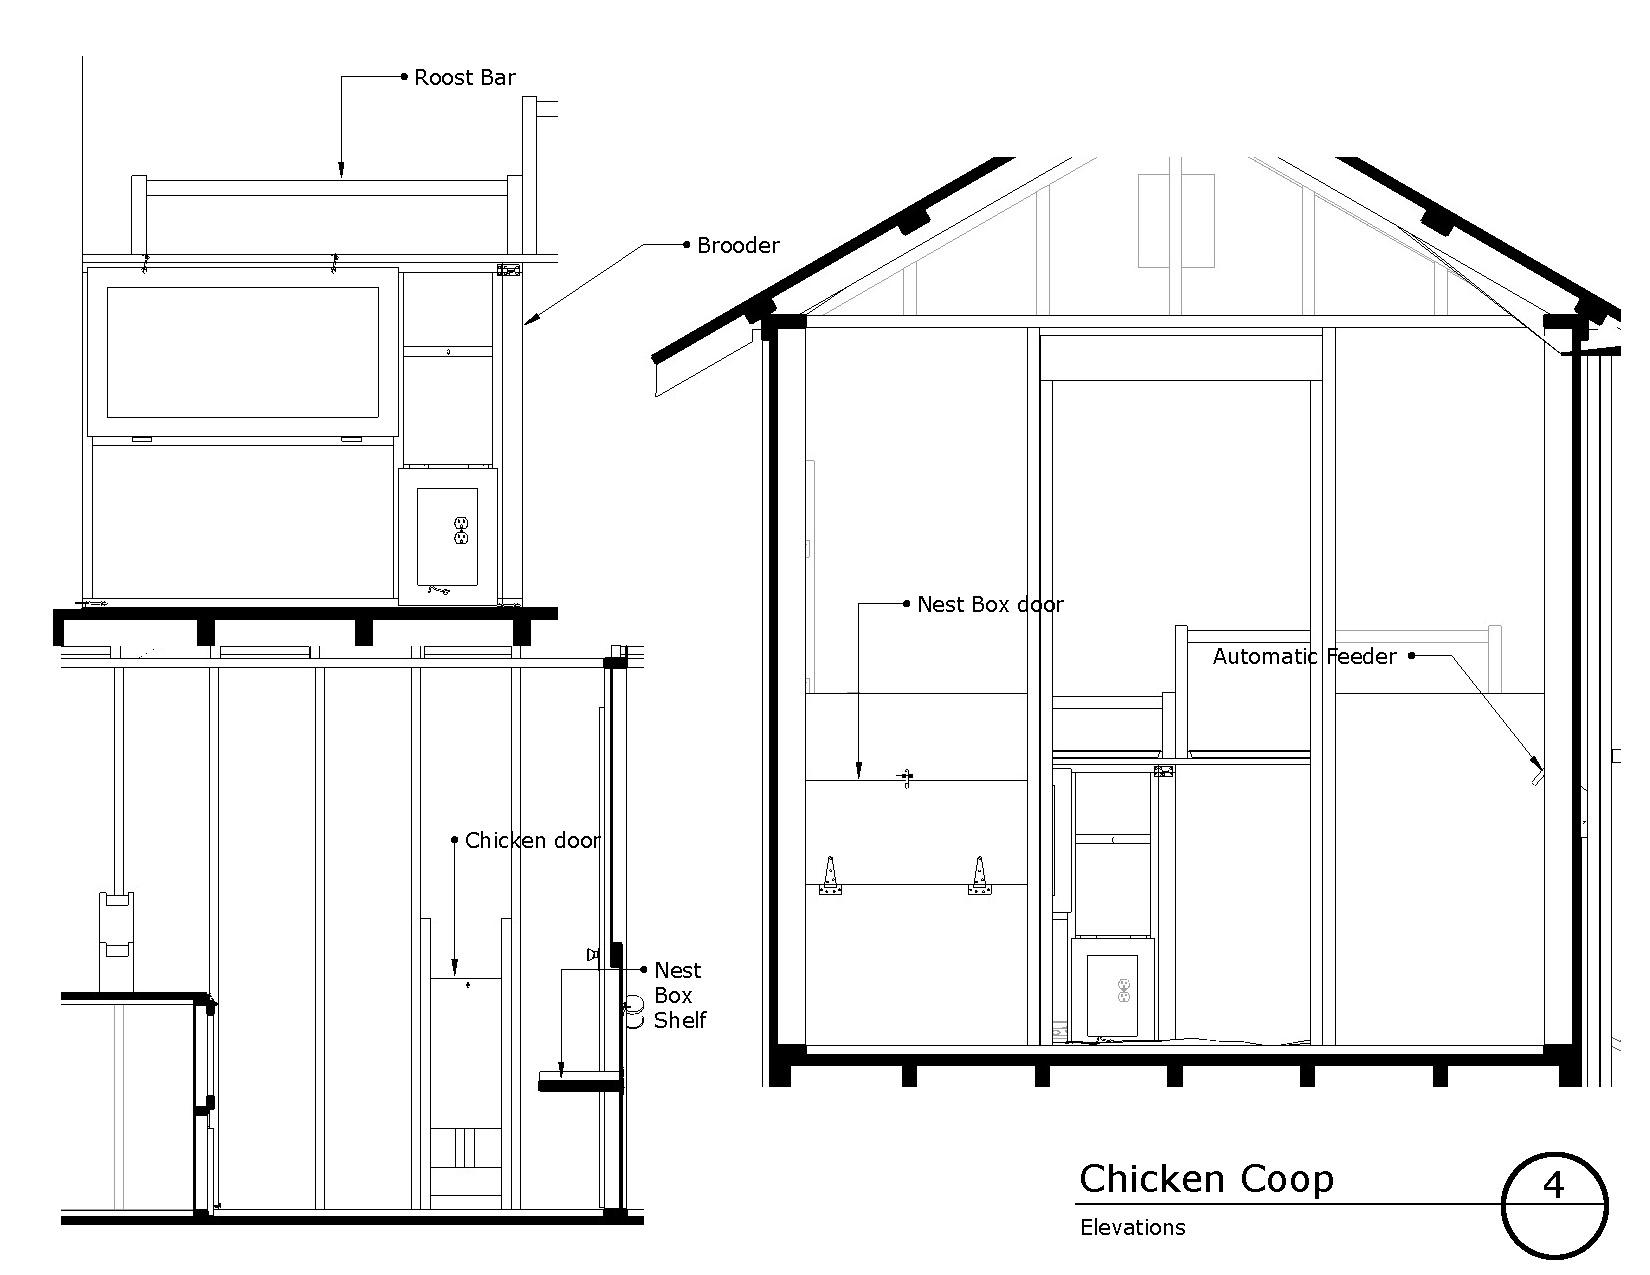 Chicken coop blueprints_Page_4.jpg